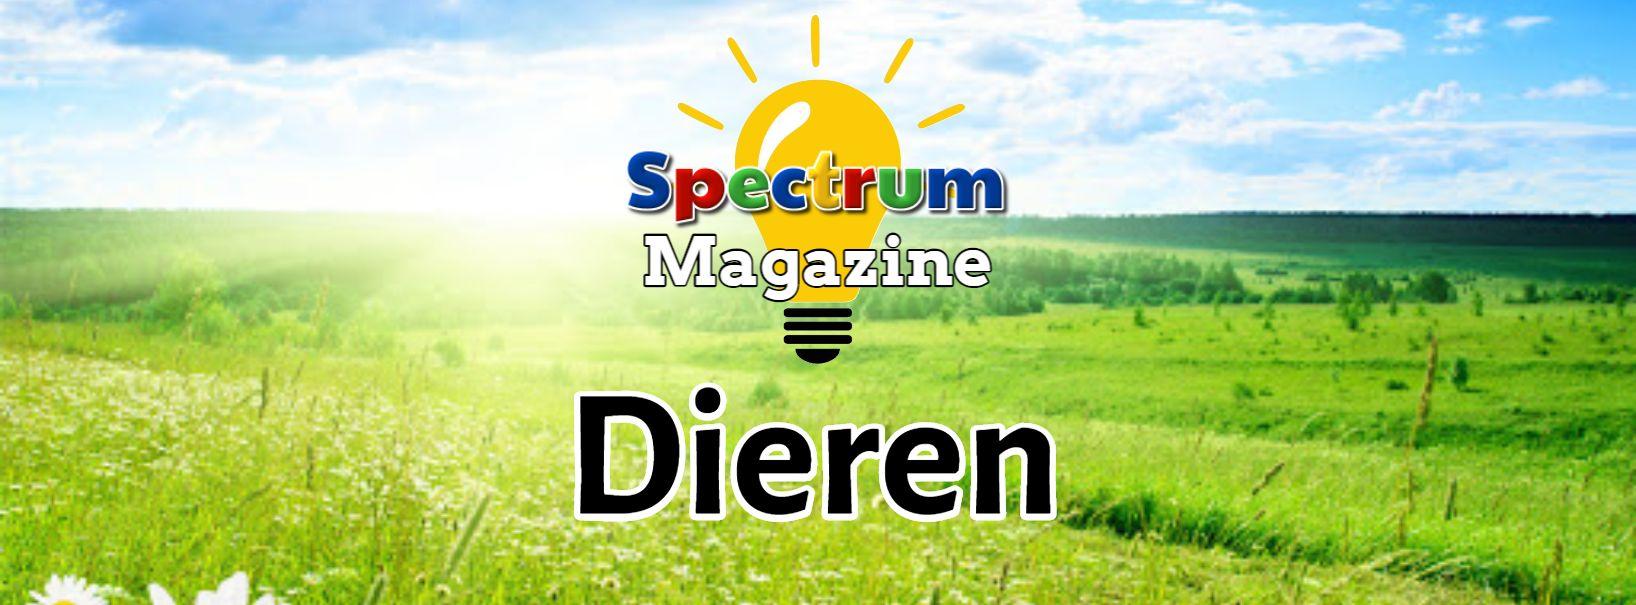 Spectrum magazine met logo DIEREN